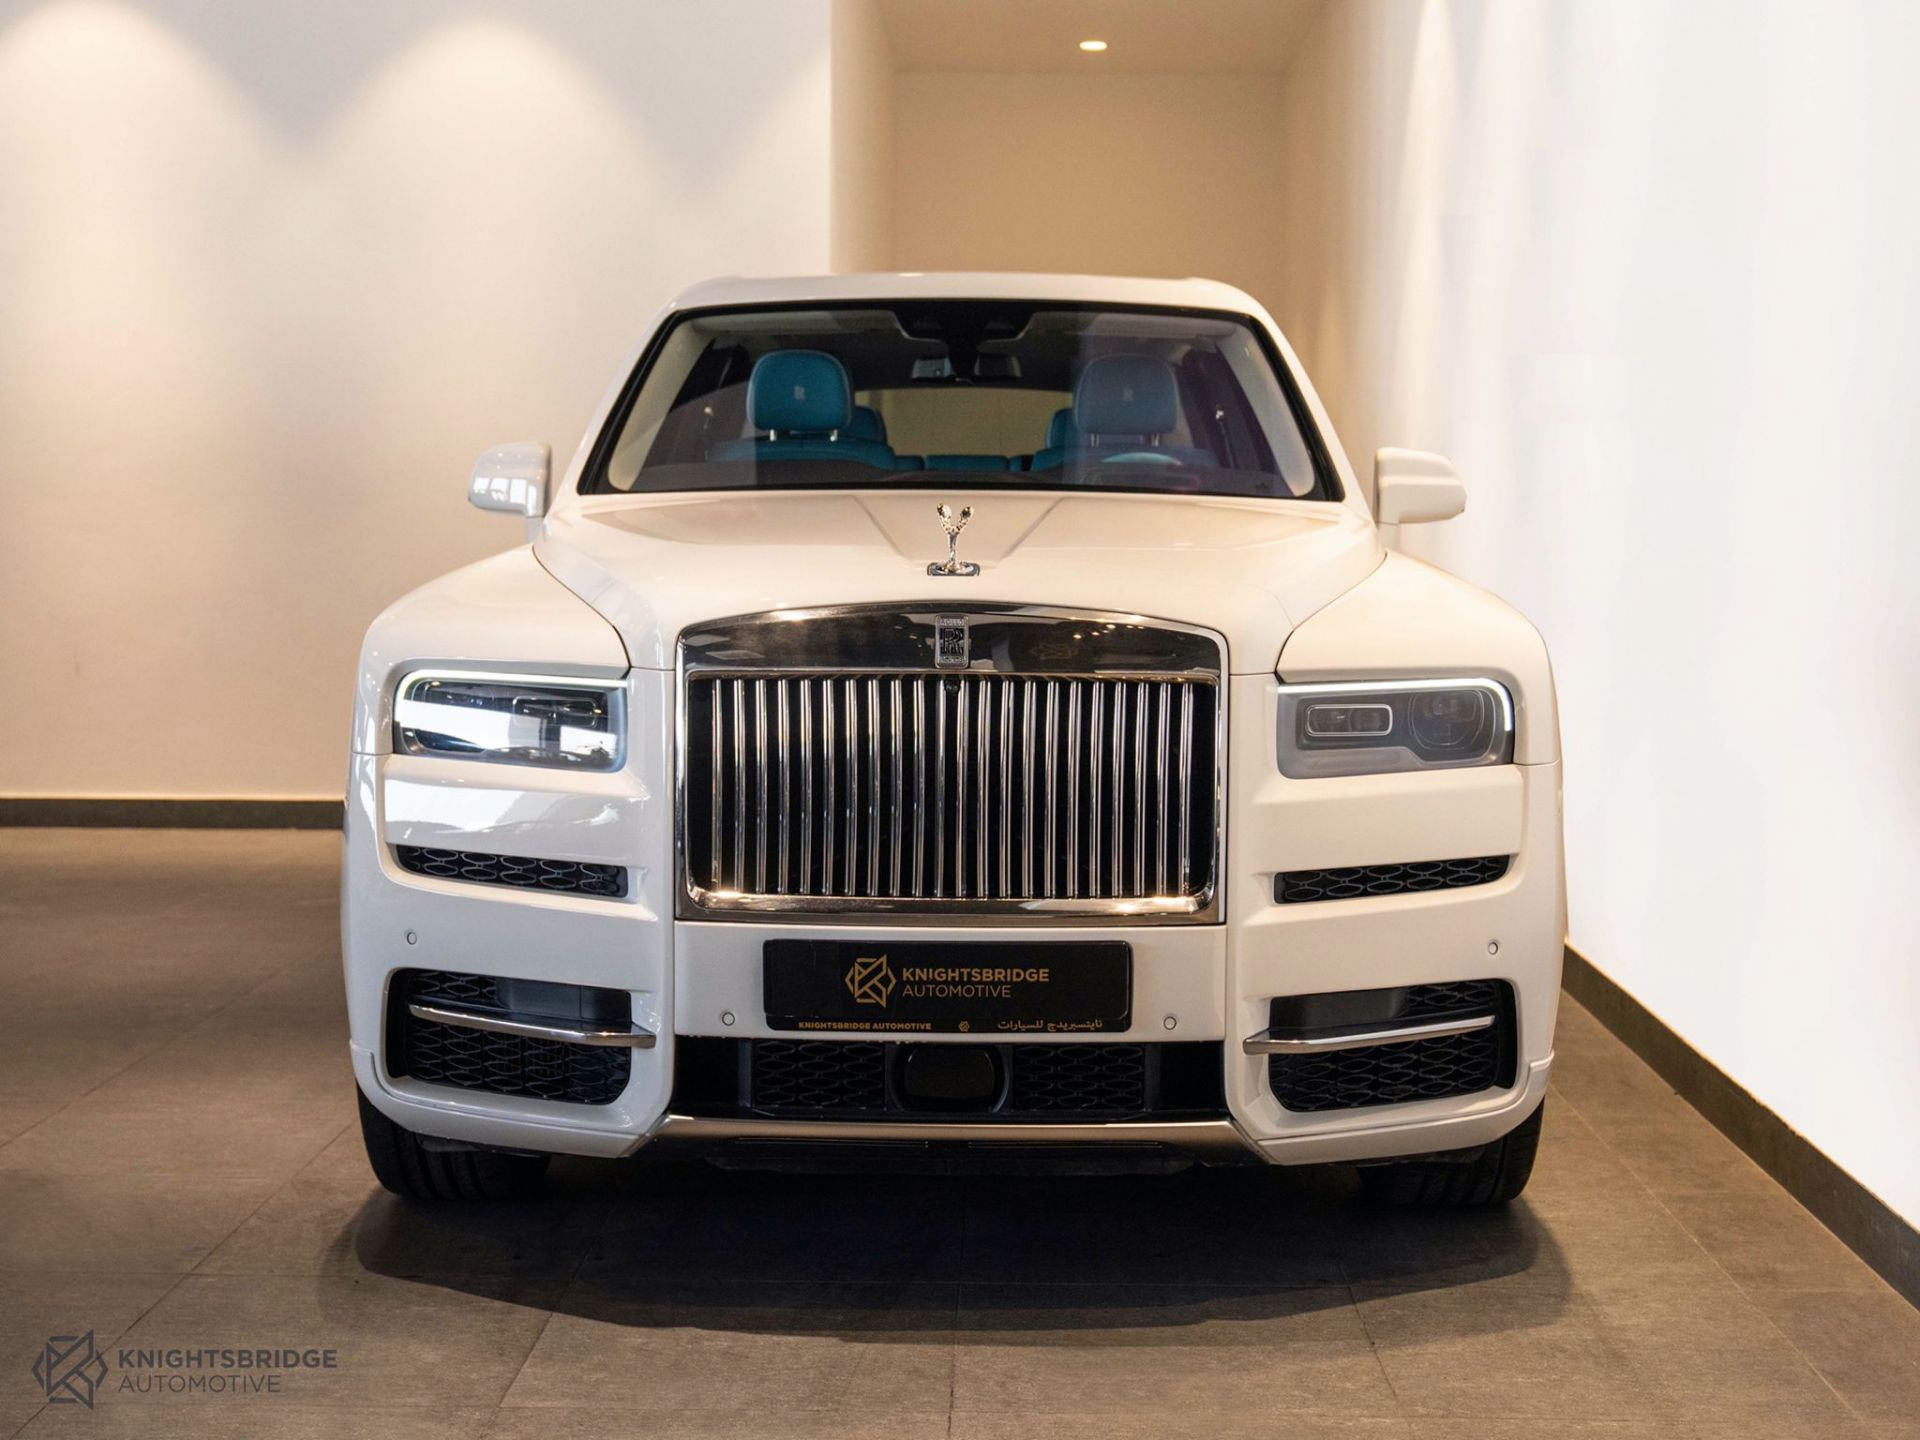 2021 Rolls-Royce Cullinan at Knightsbridge Automotive - (10061 - 2)